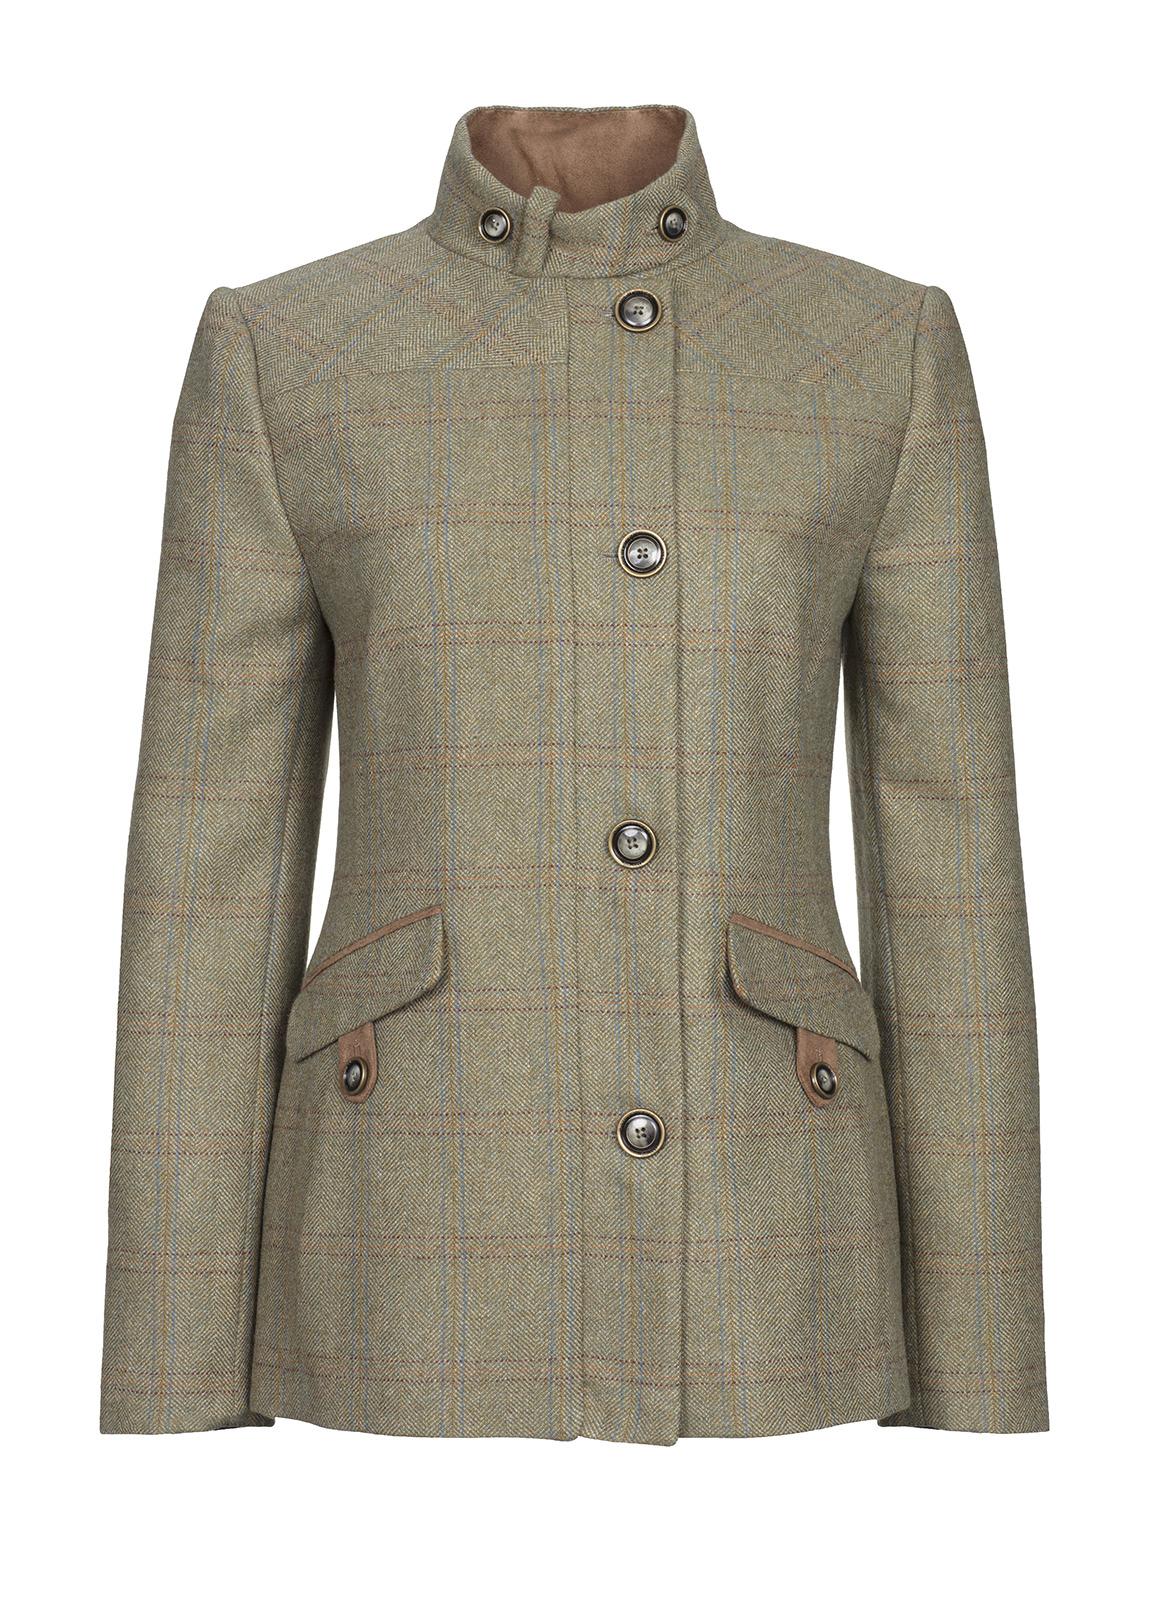 Dubarry_ Heatherbell Tweed Jacket - Acorn_Image_2